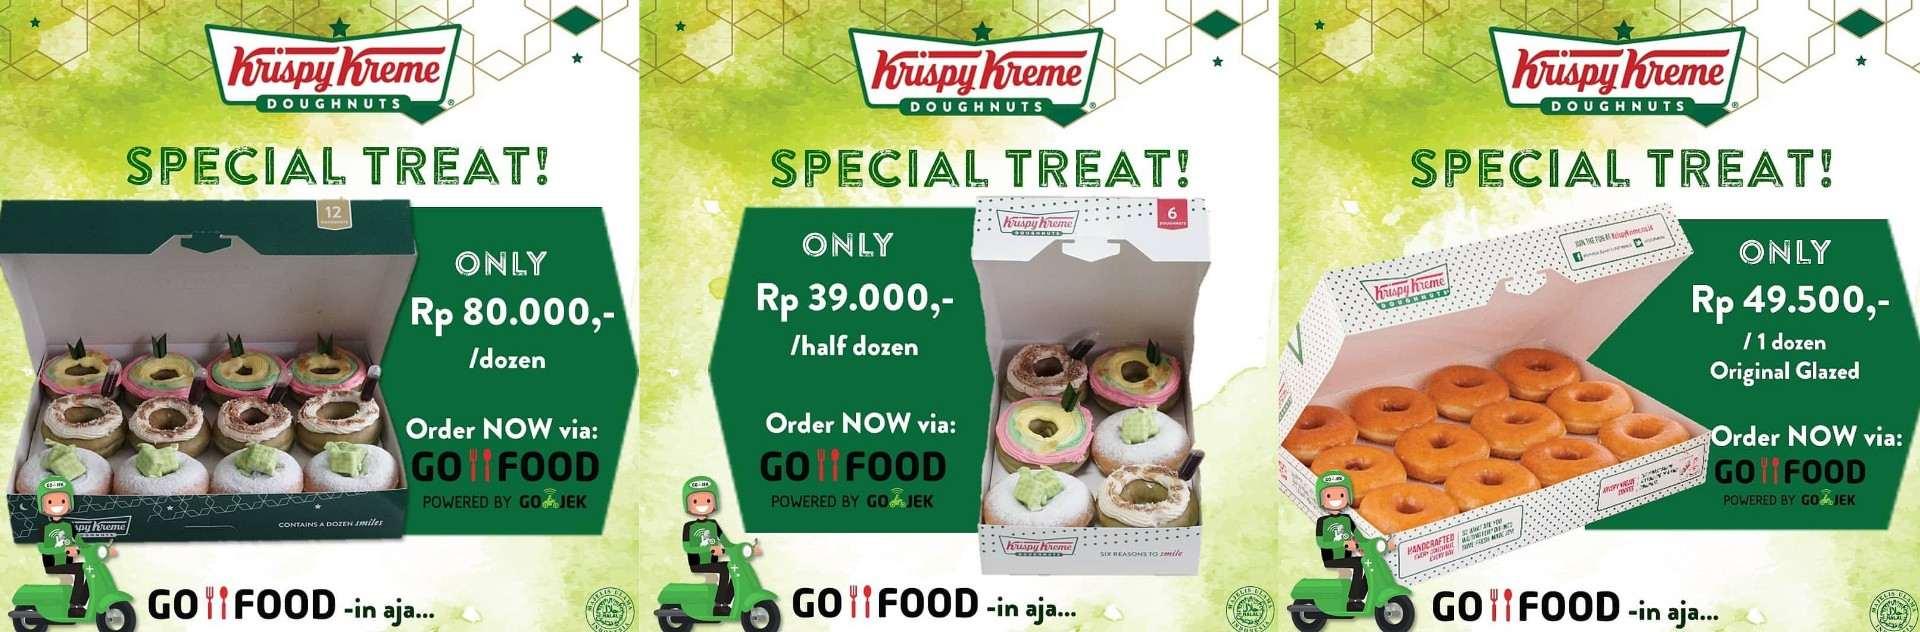 Diskon KRISPY KREME Promo Harga Spesial khusus untuk pemesanan via GOFOOD